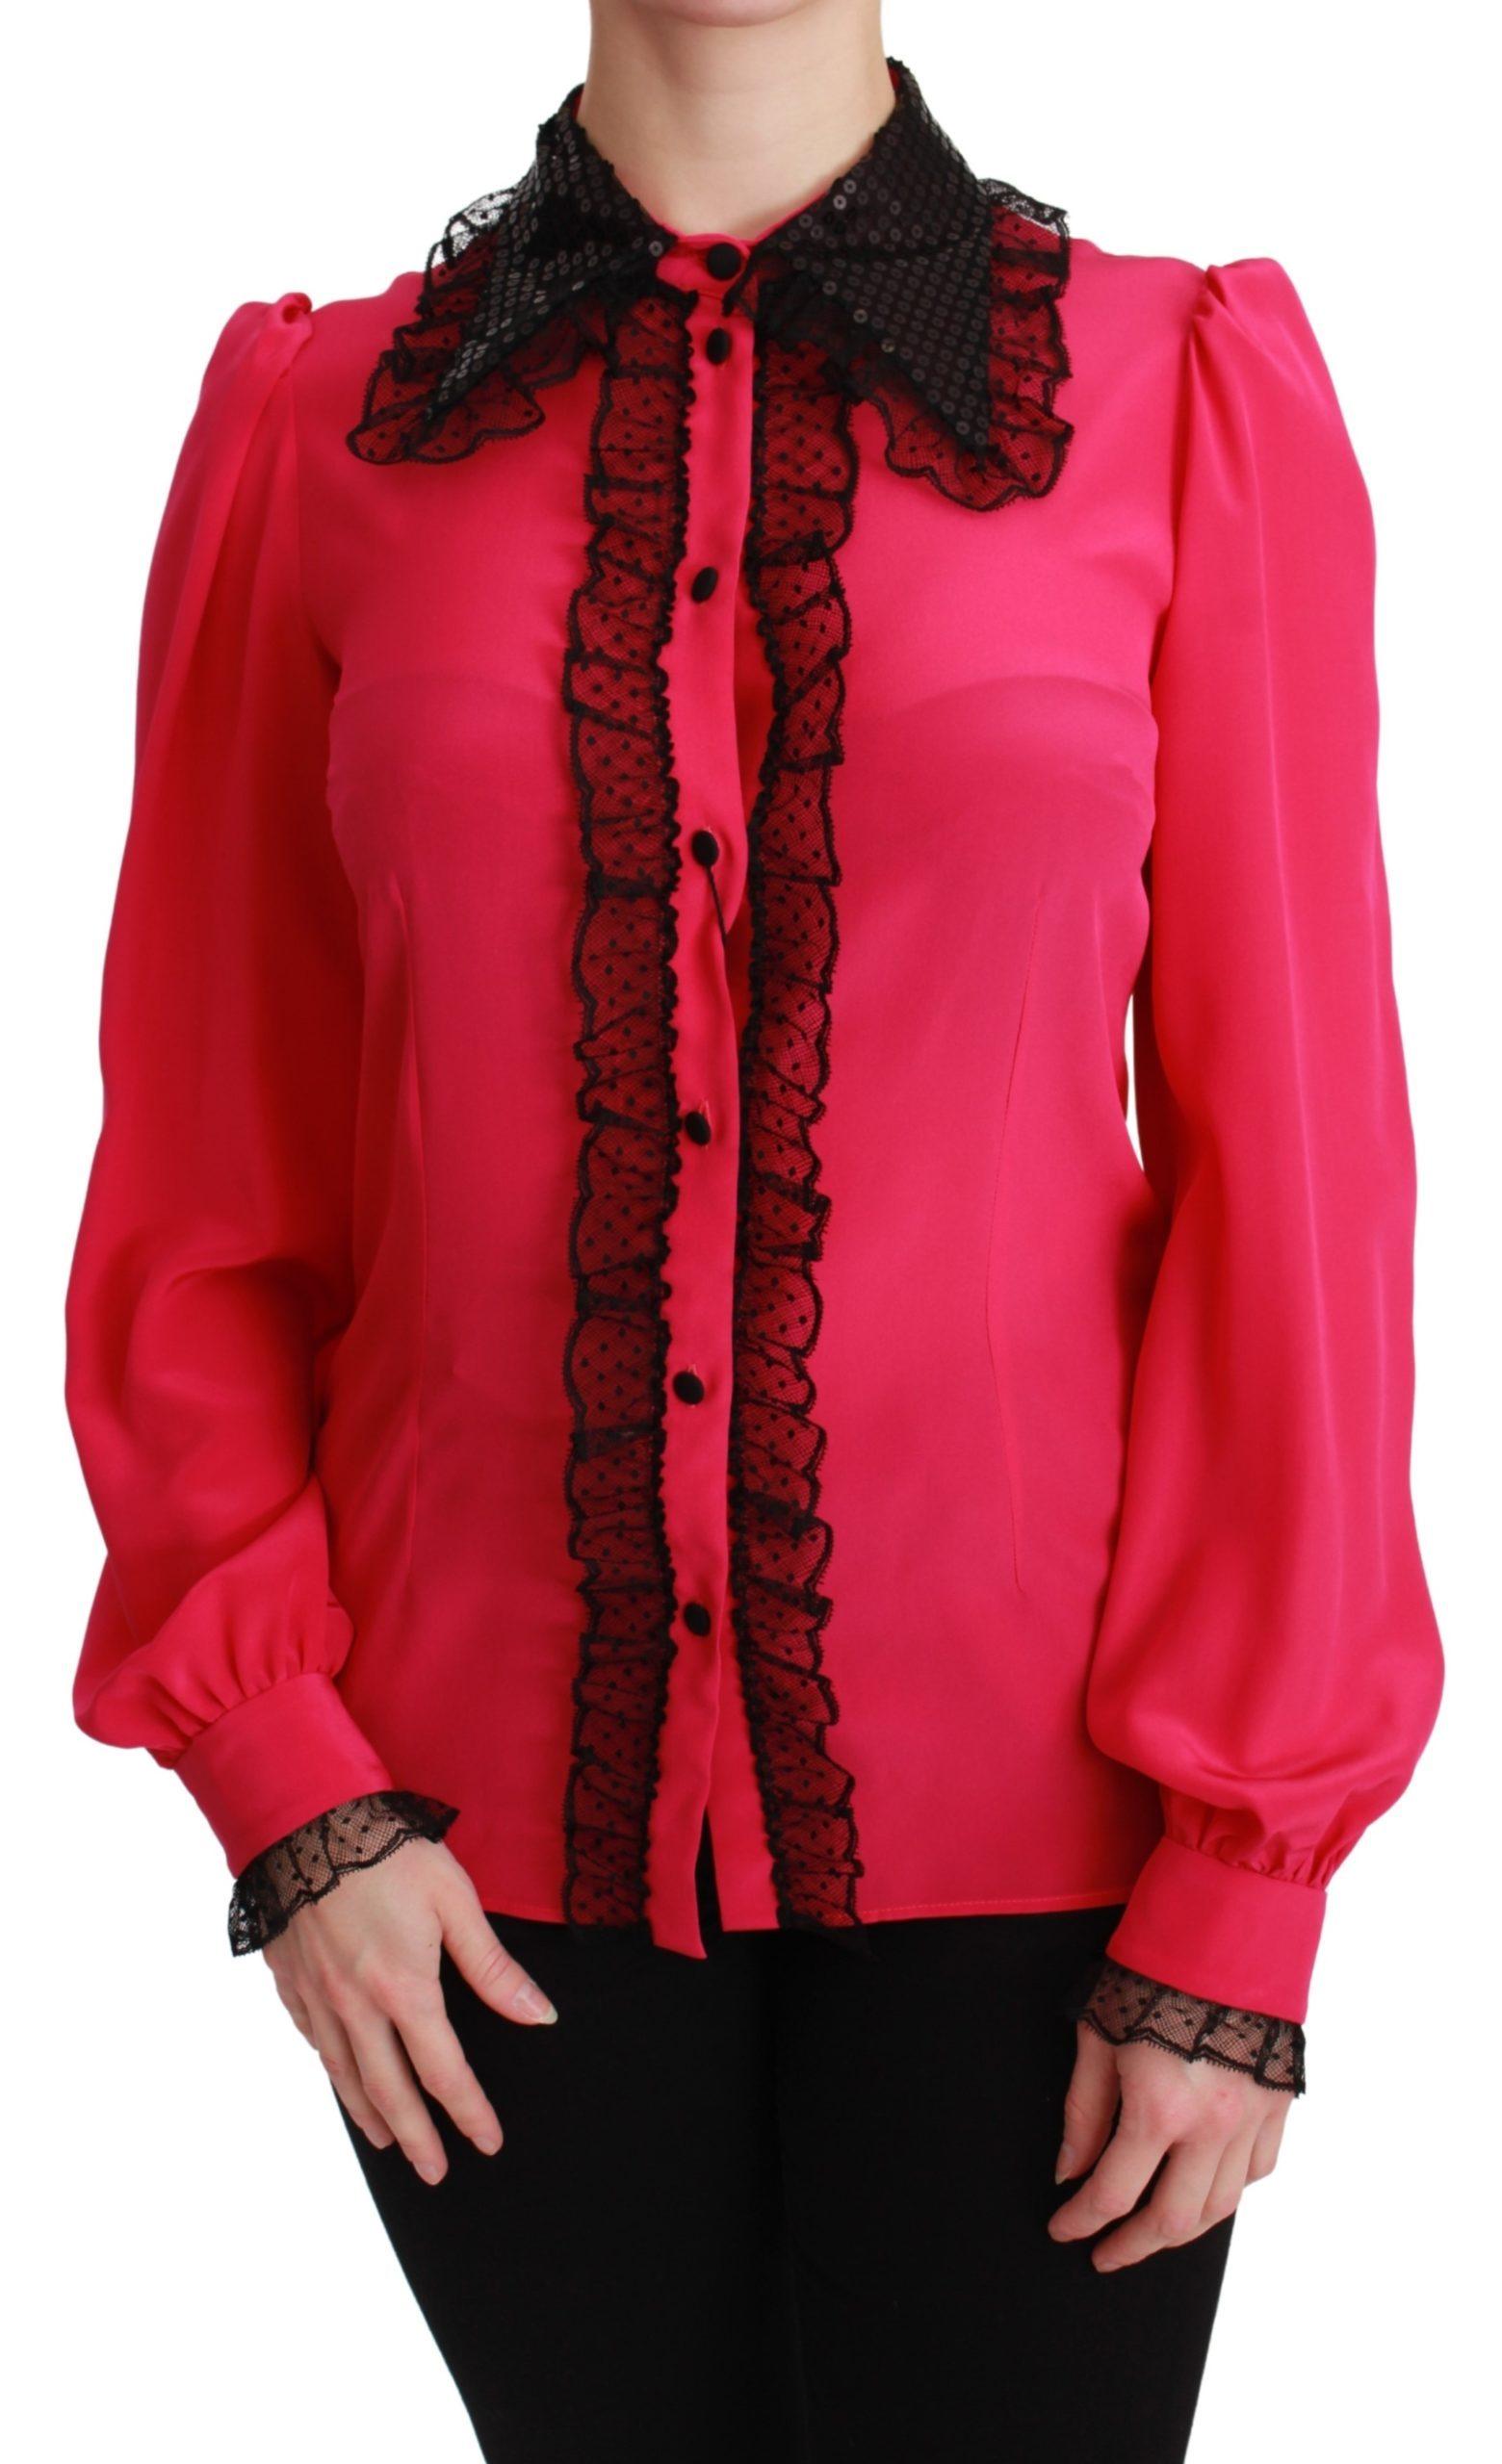 Dolce & Gabbana Women's Silk Sequin Lace Shirt Pink TSH2673 - IT38|XS